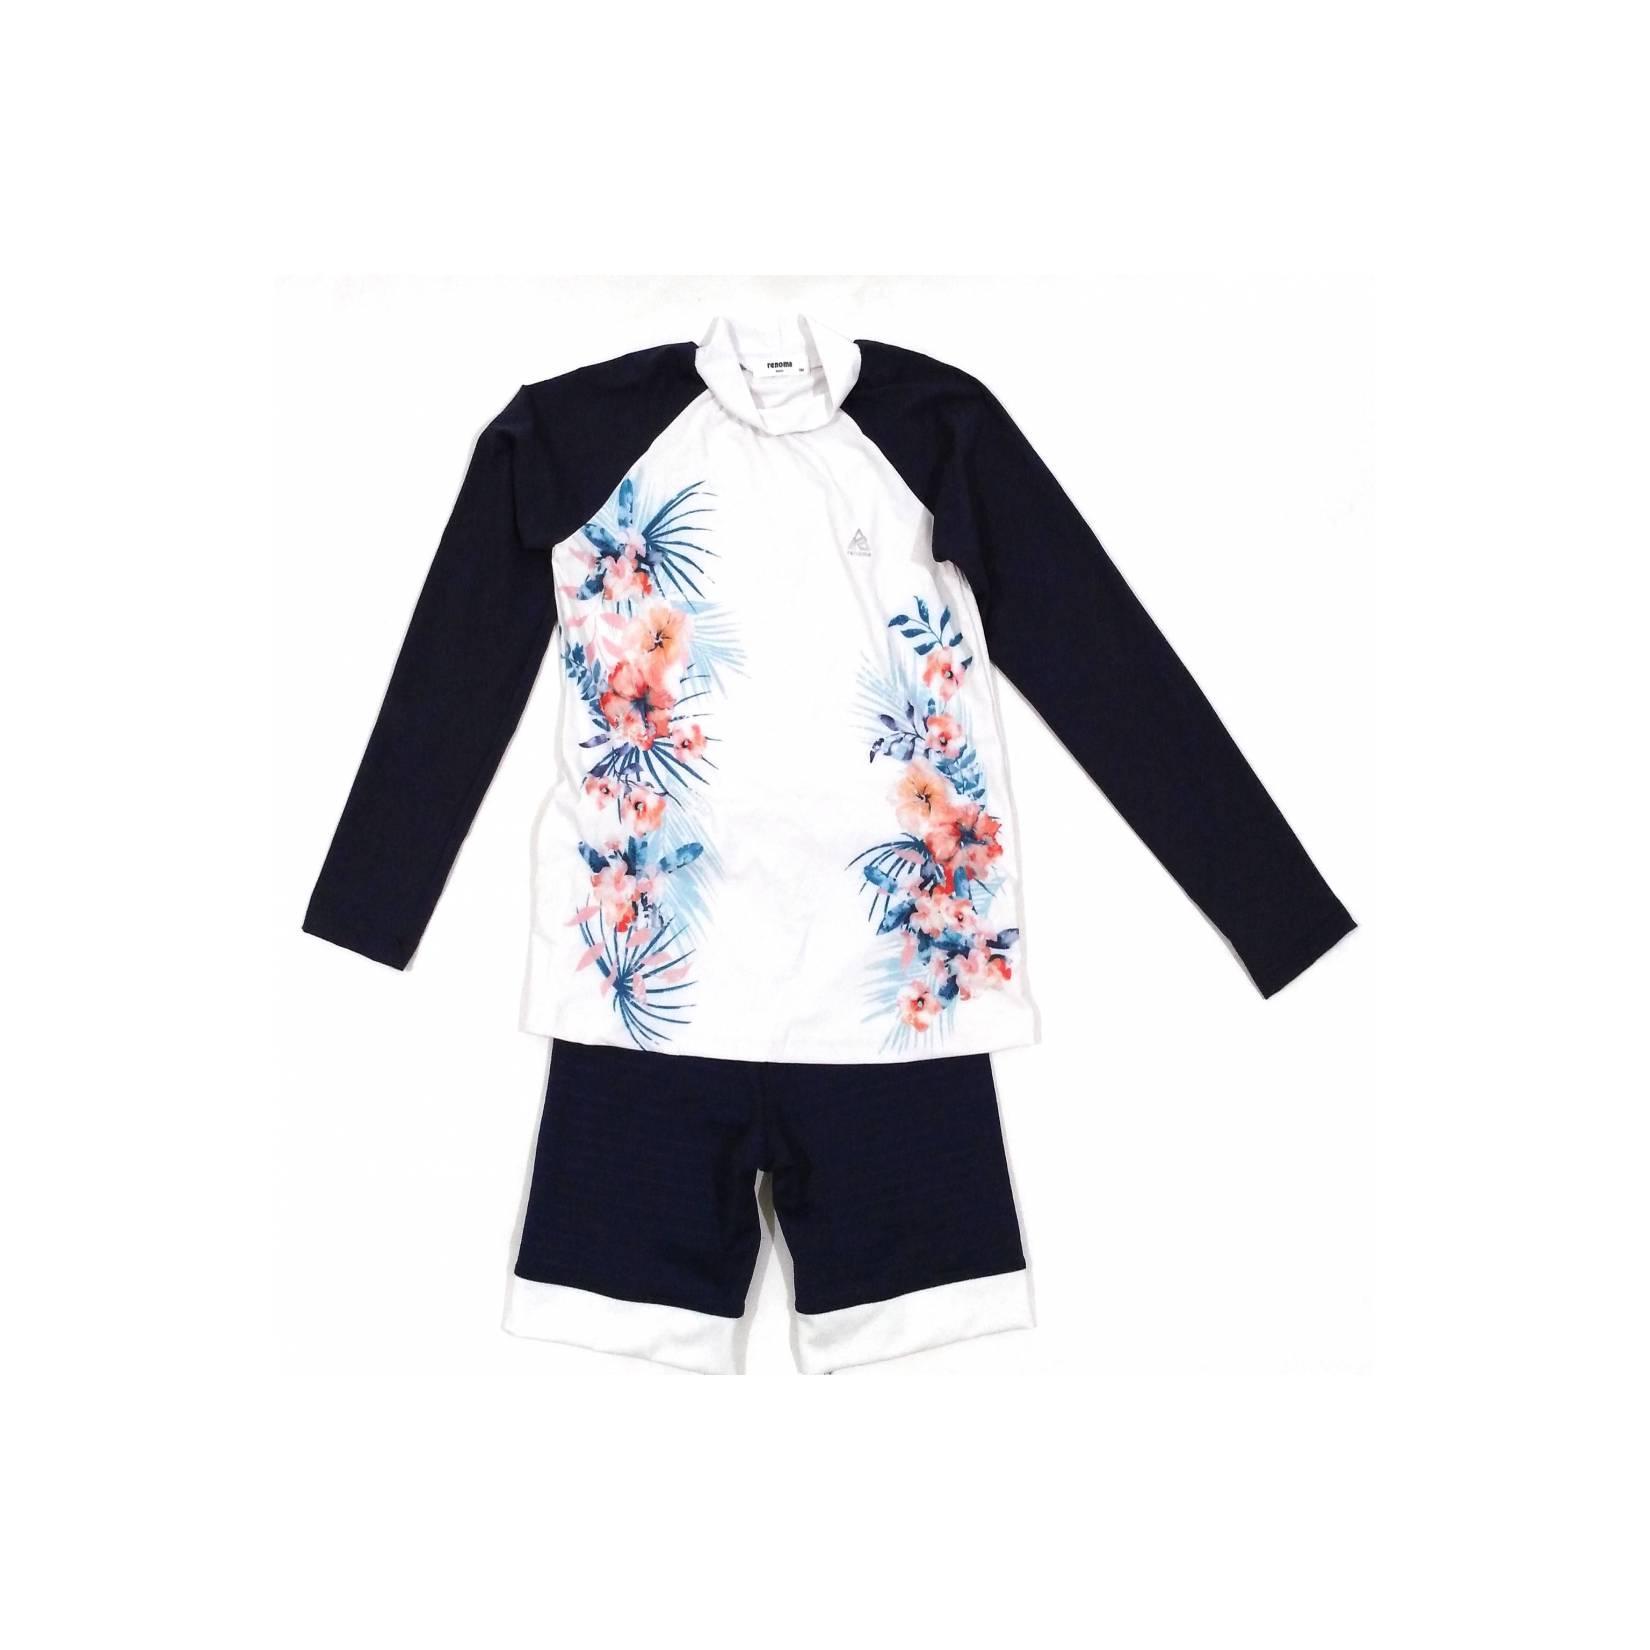 Baju Renang Diving Set Lengan Panjang Renoma Bunga Import Anak Cewe